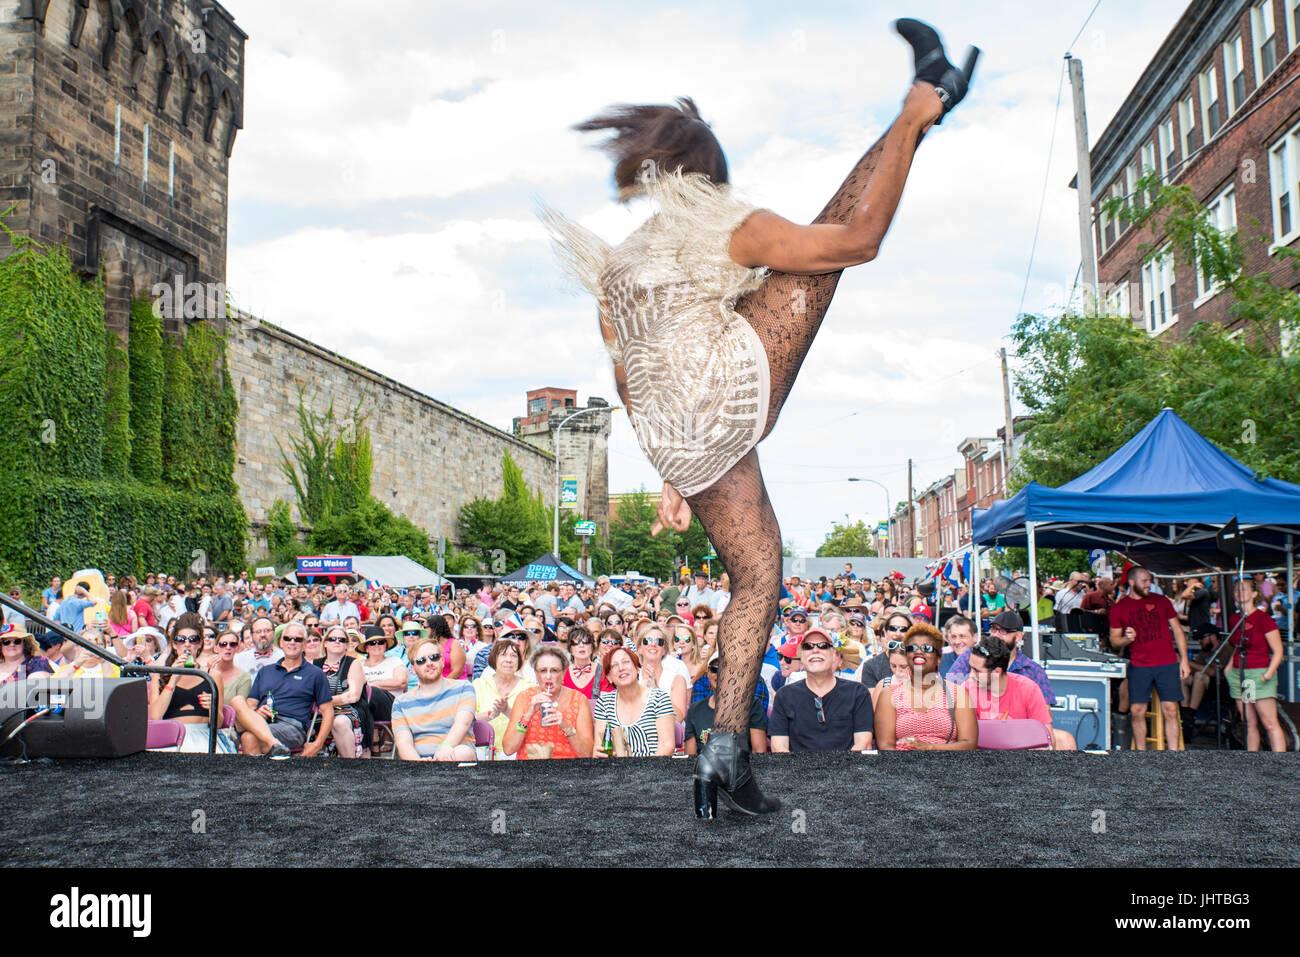 Philadelphia, USA. 15th July, 2017. The Bearded Ladies Bastille Day Cabaret. Credit: Christopher Evens/Alamy Live - Stock Image